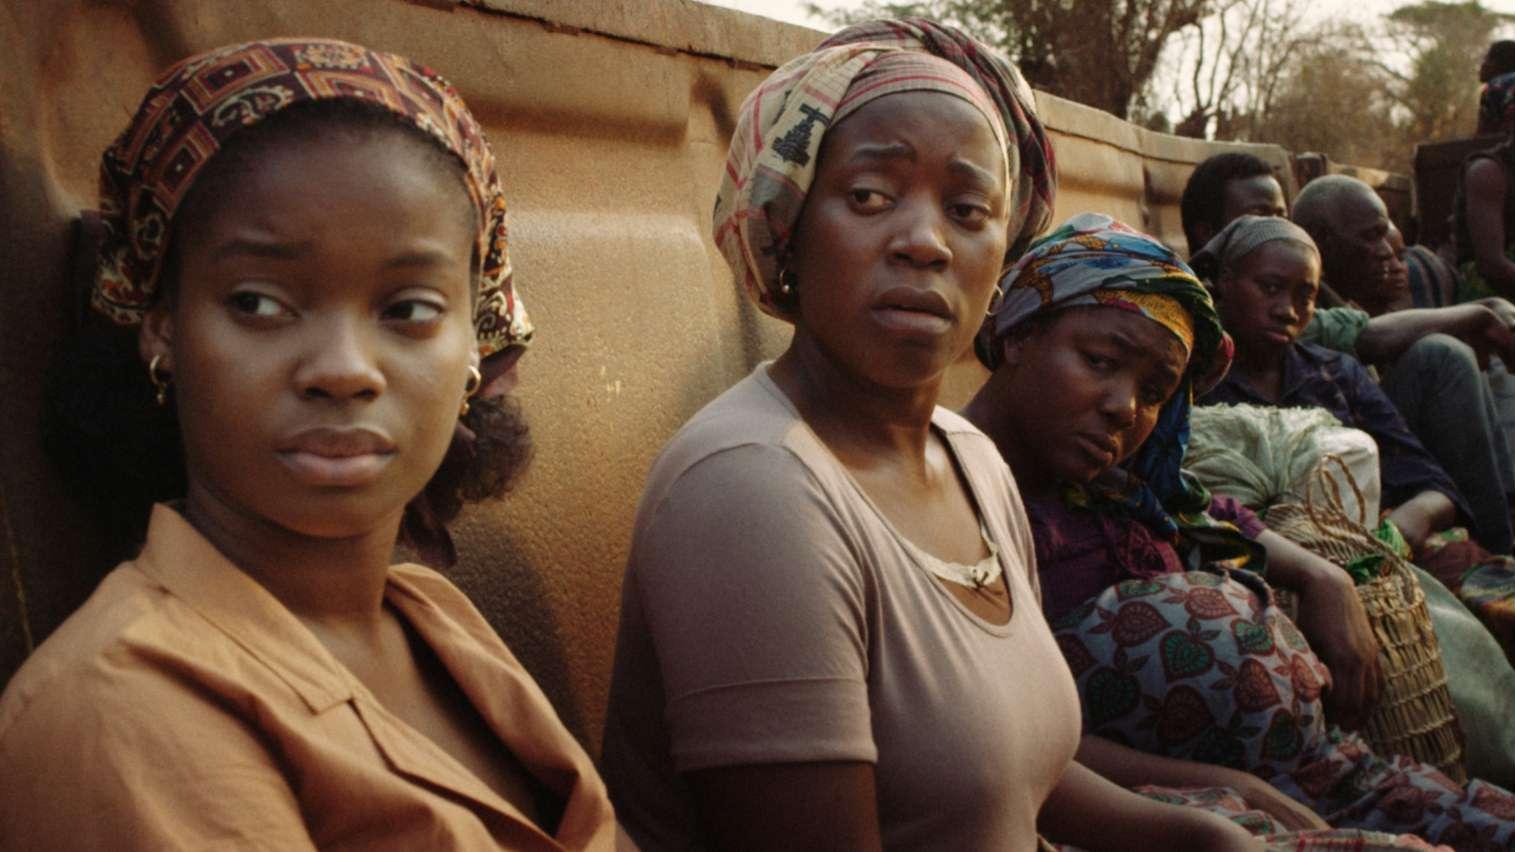 Filme moçambicano premiado em Marrocos